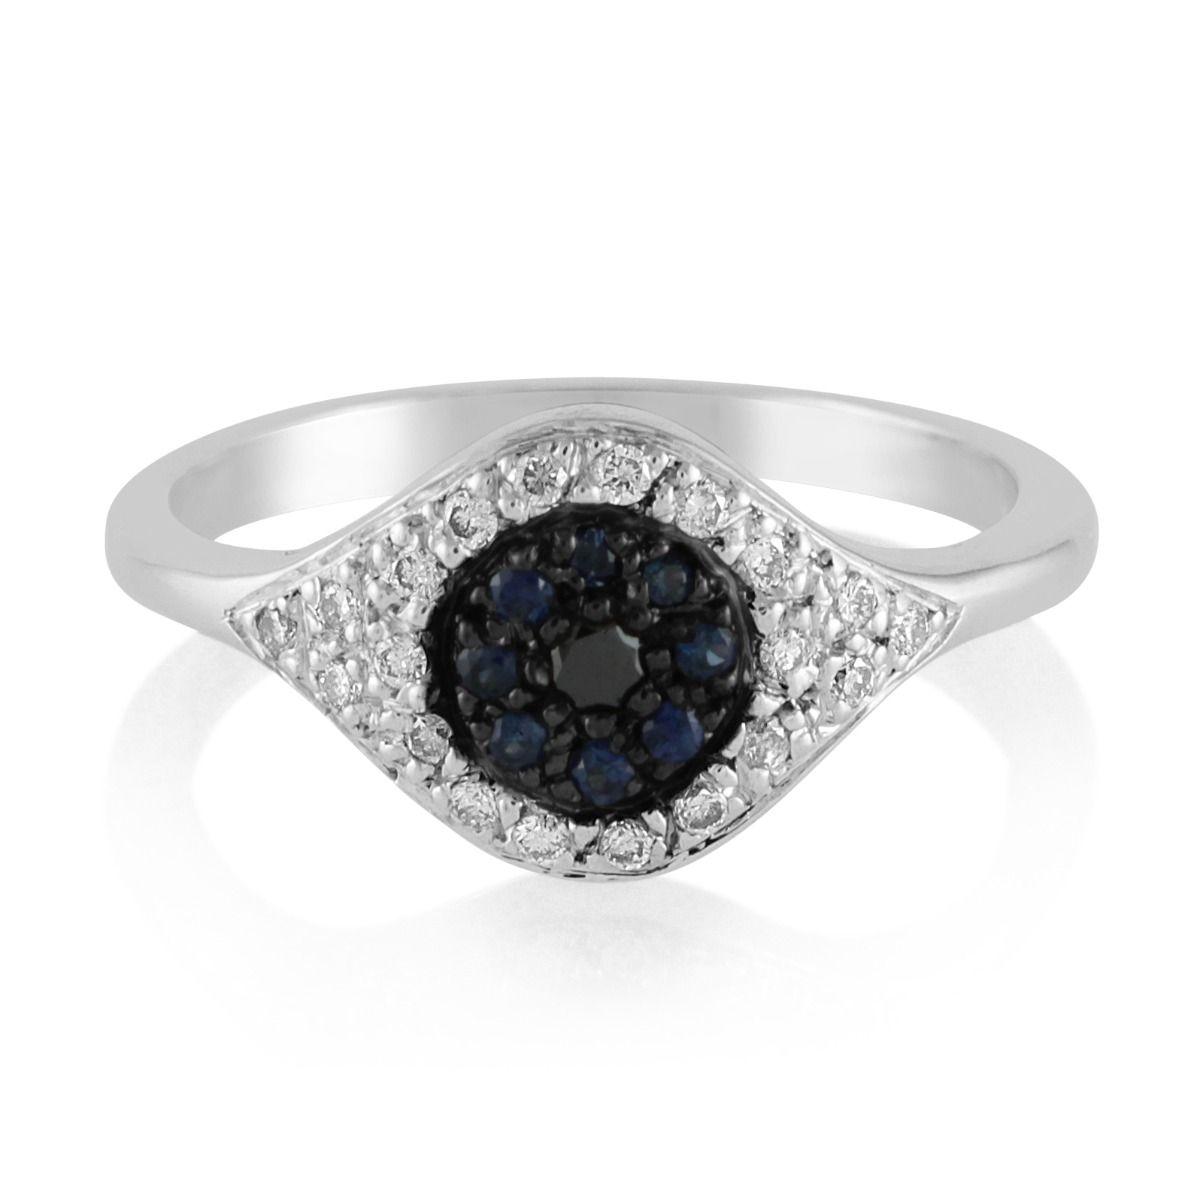 Qvc Jewelry | Chd Jewelry | Ileana Makri